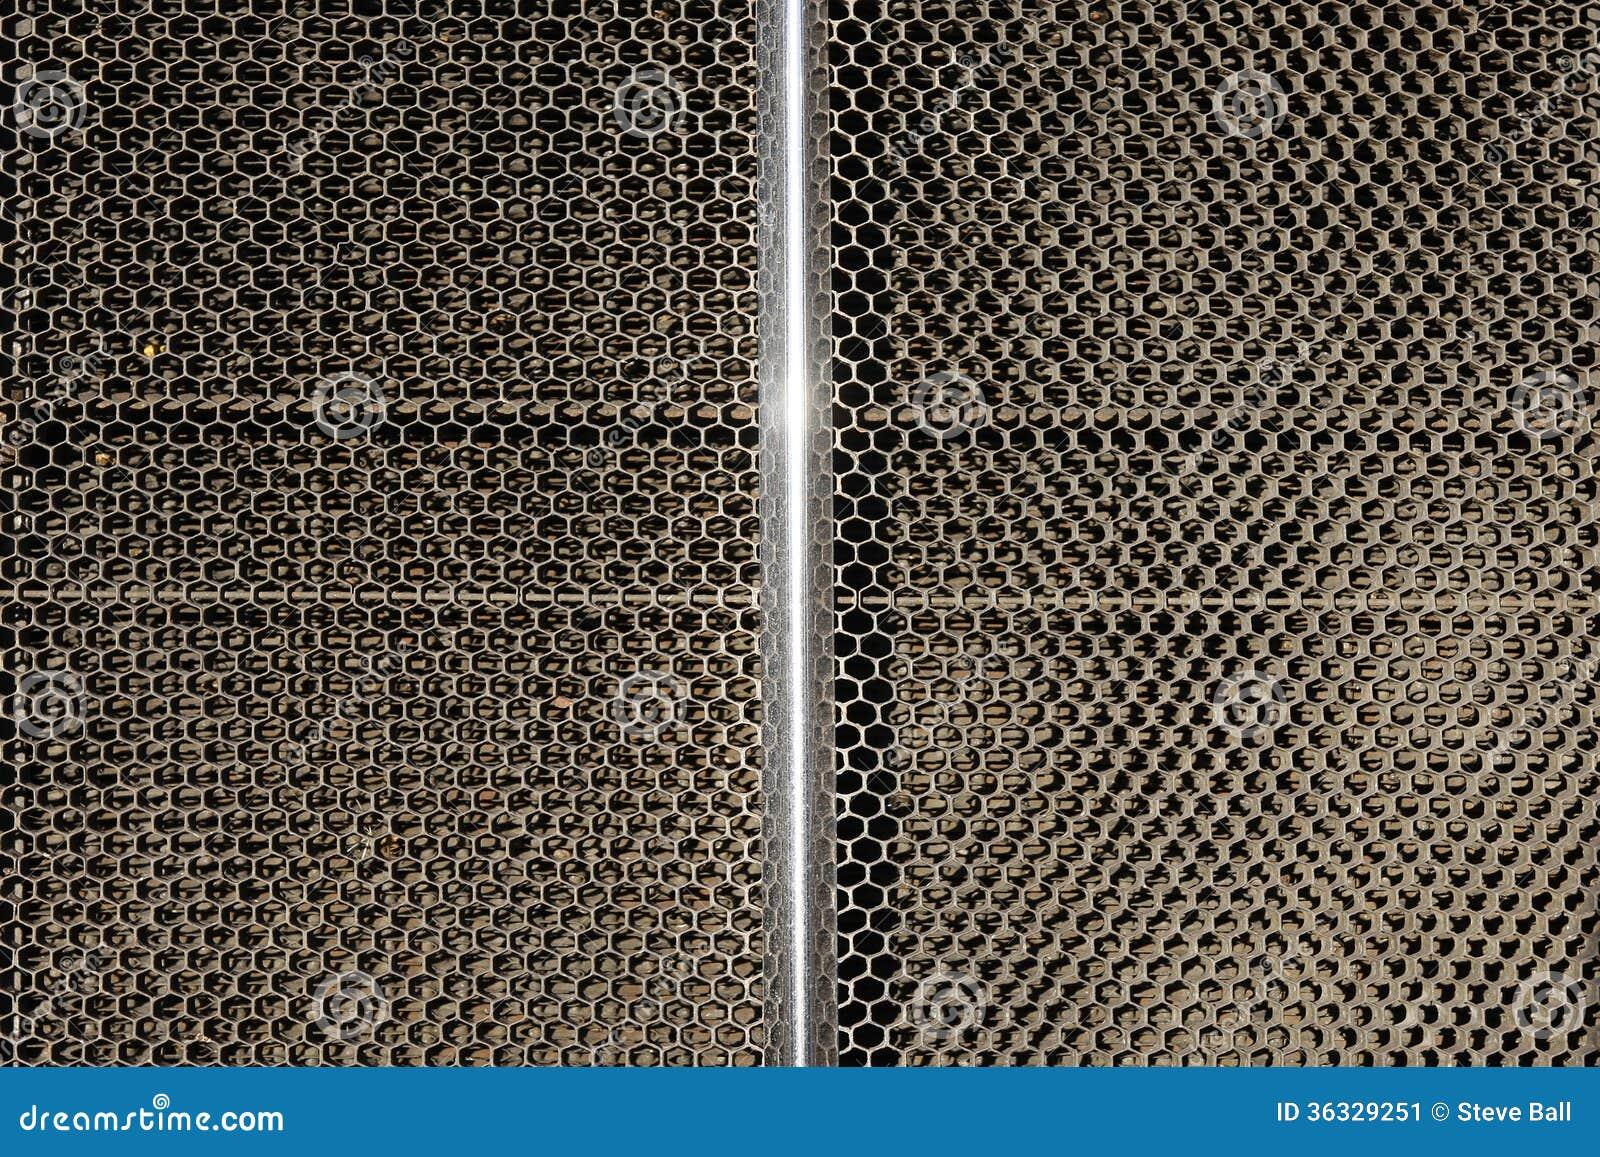 Design of a car radiator - Classic Car Radiator